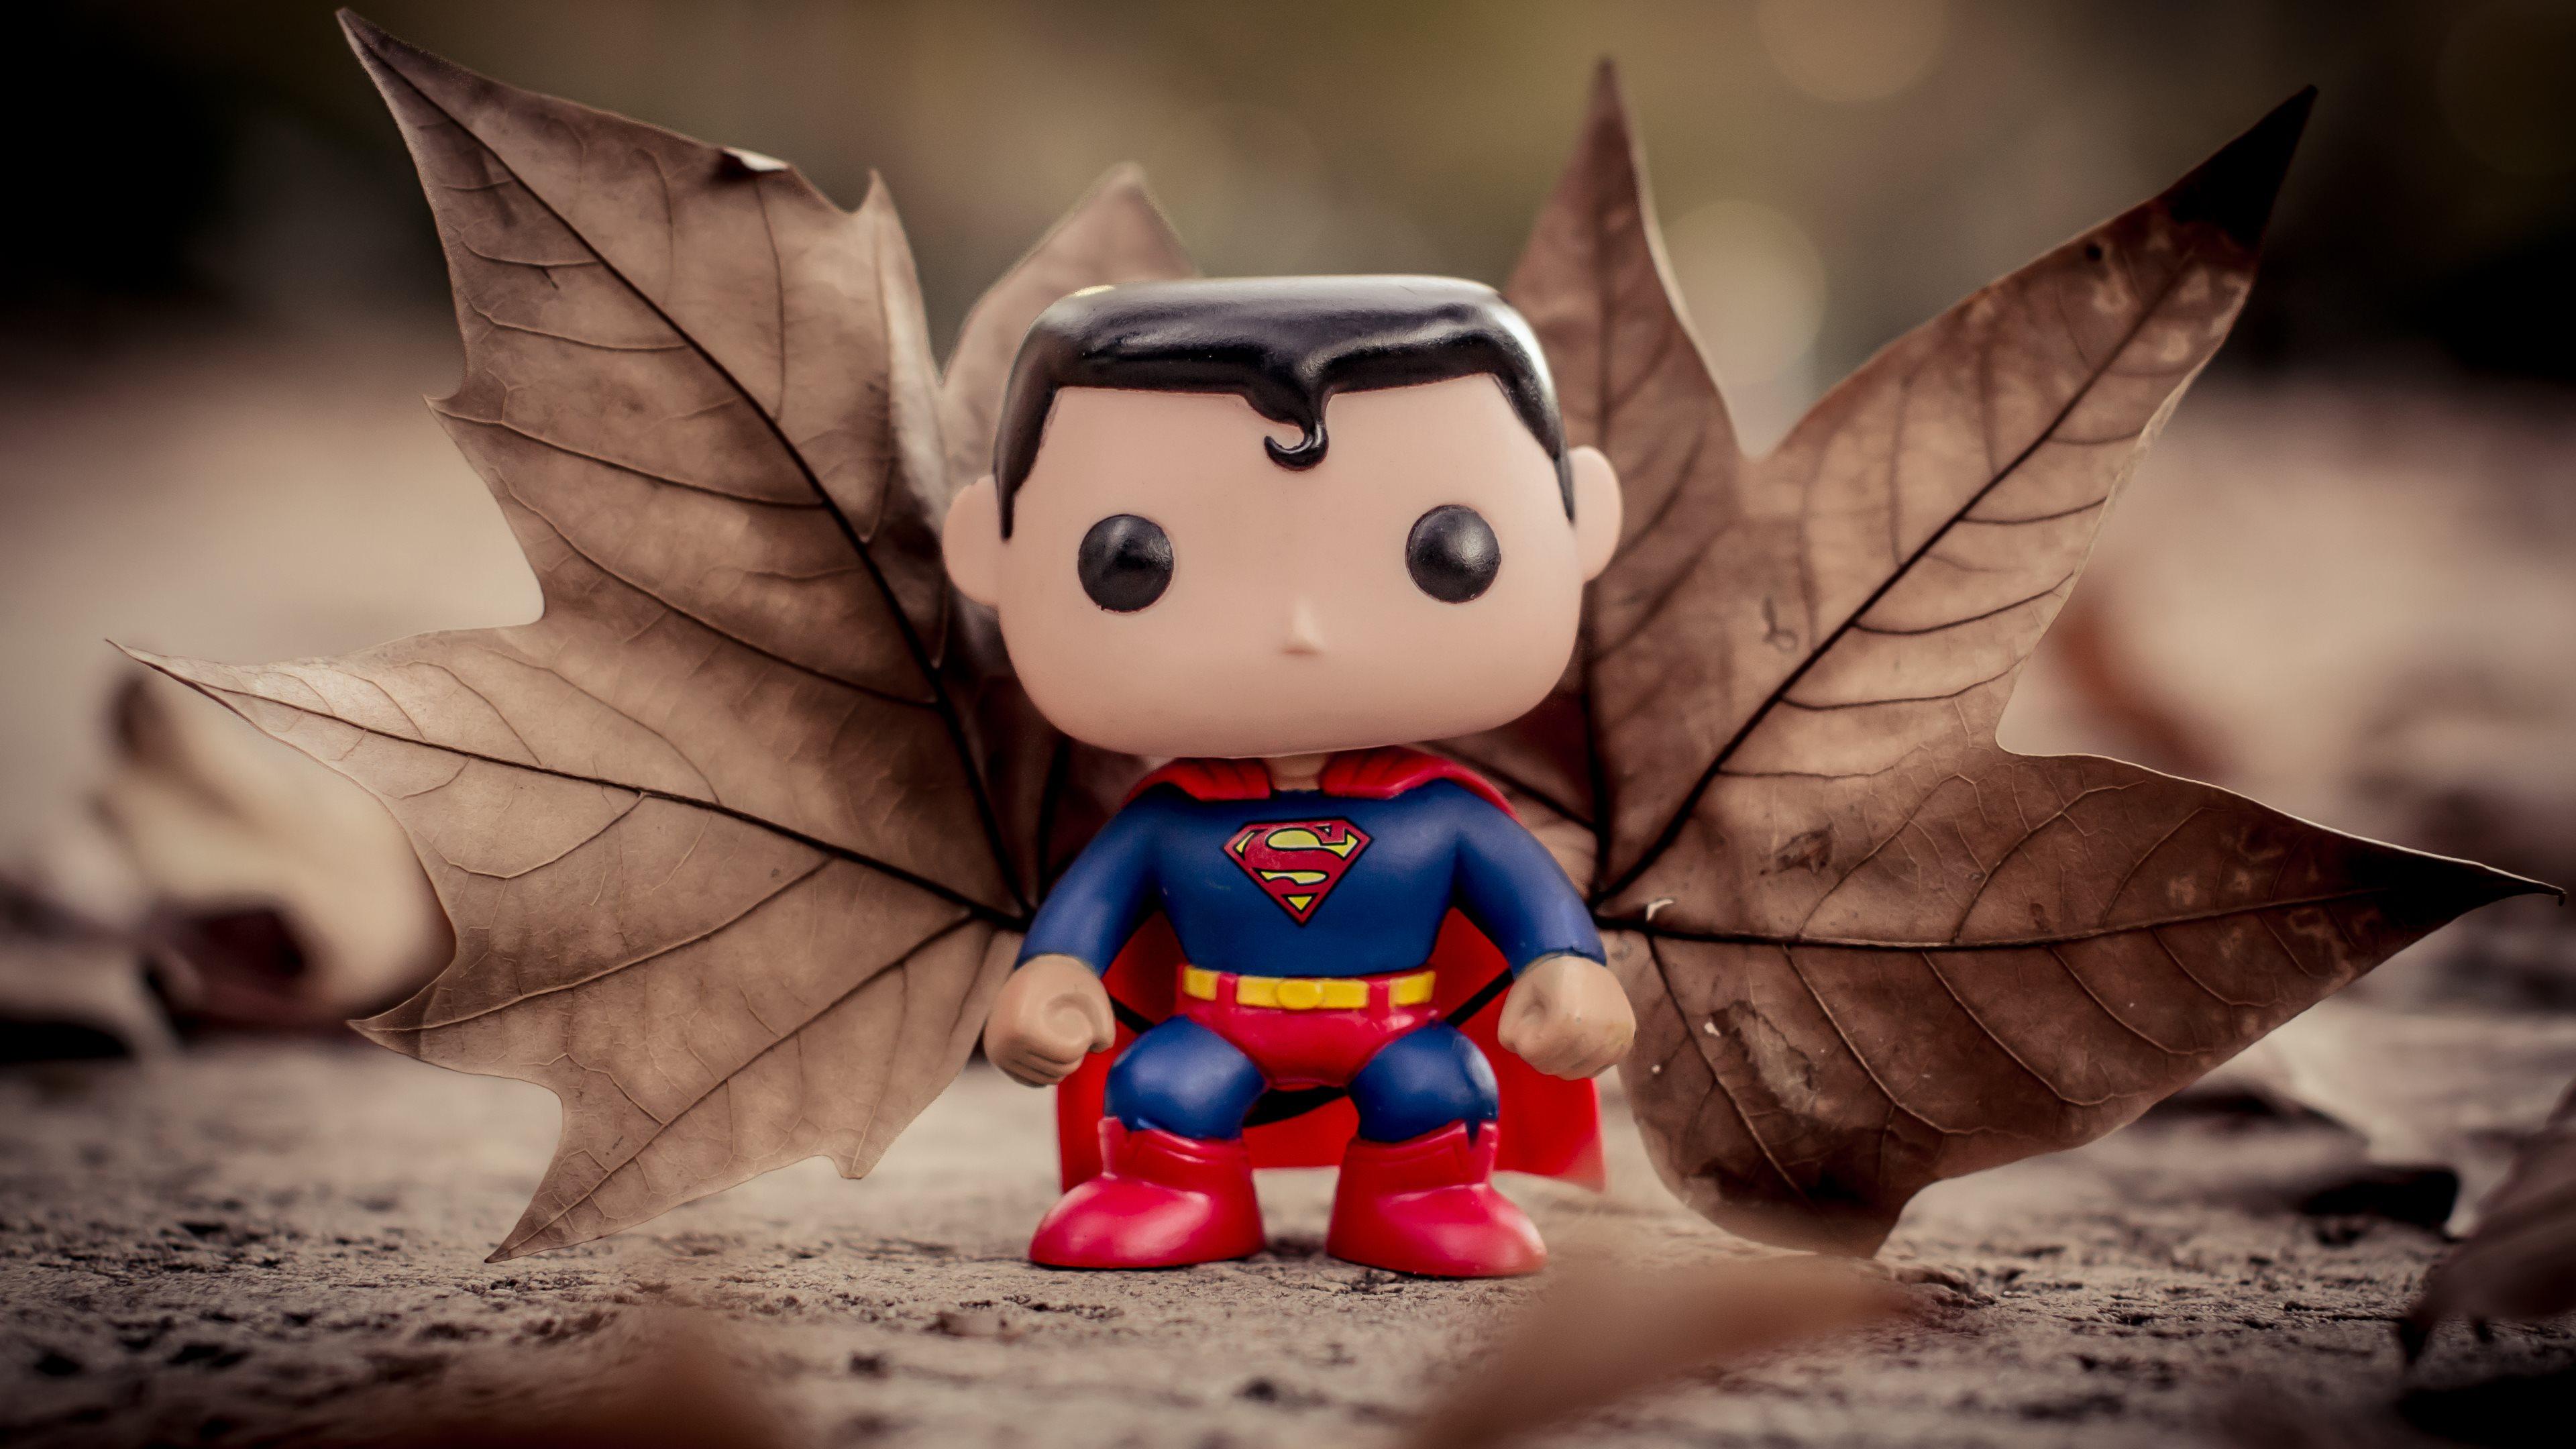 Little Superman   The funny figurine 3840x2160